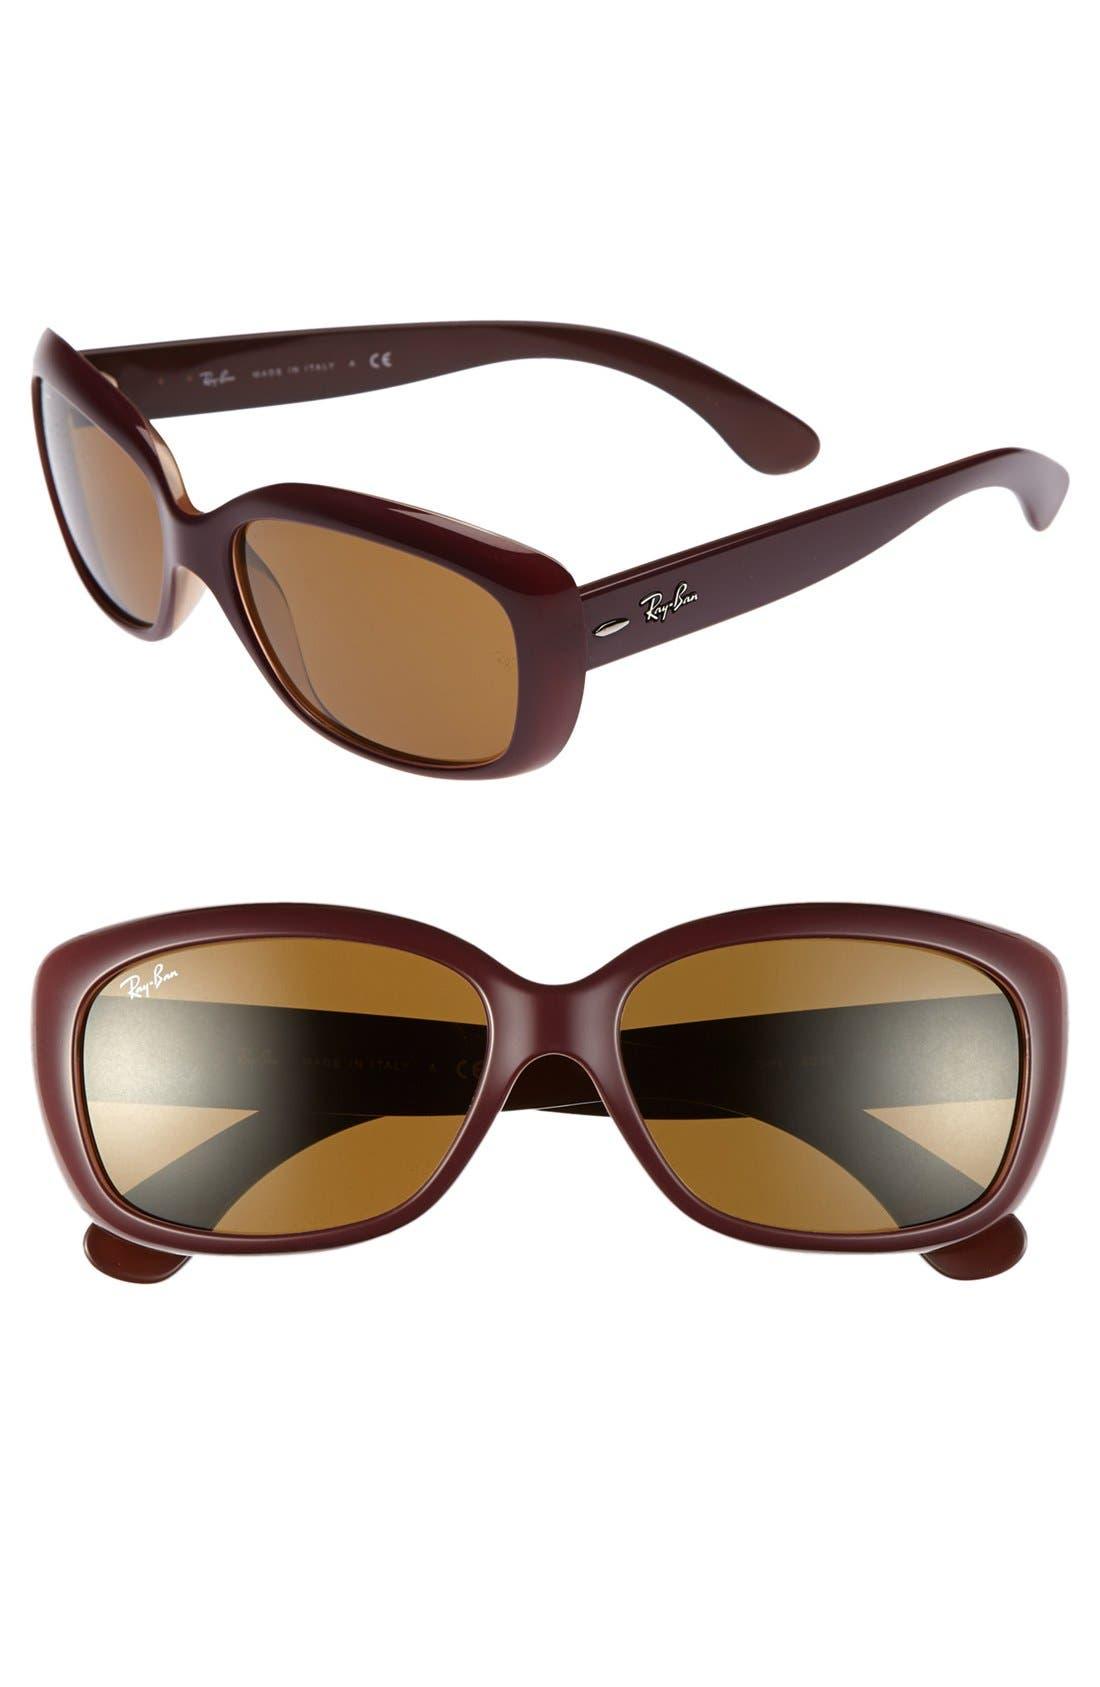 Main Image - Ray-Ban 'Pilot' 58mm Sunglasses